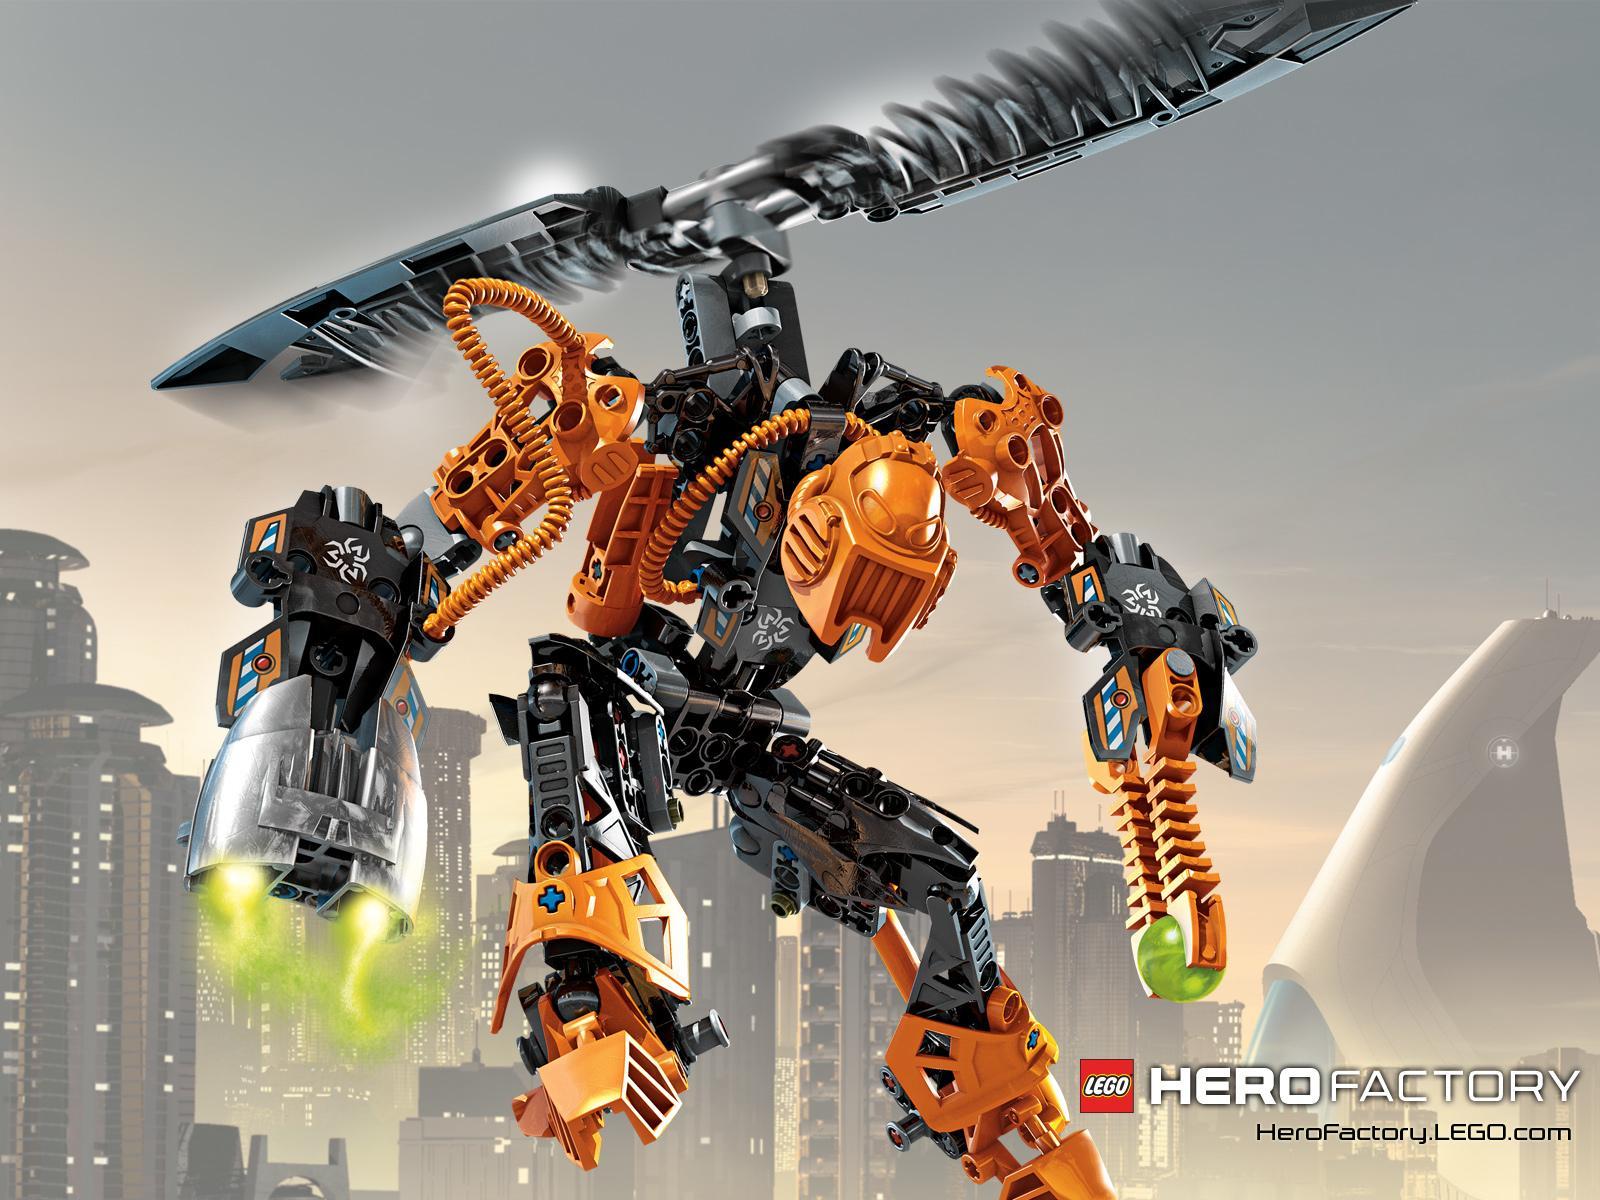 Lego Hero Factory Wallpaper HD Download